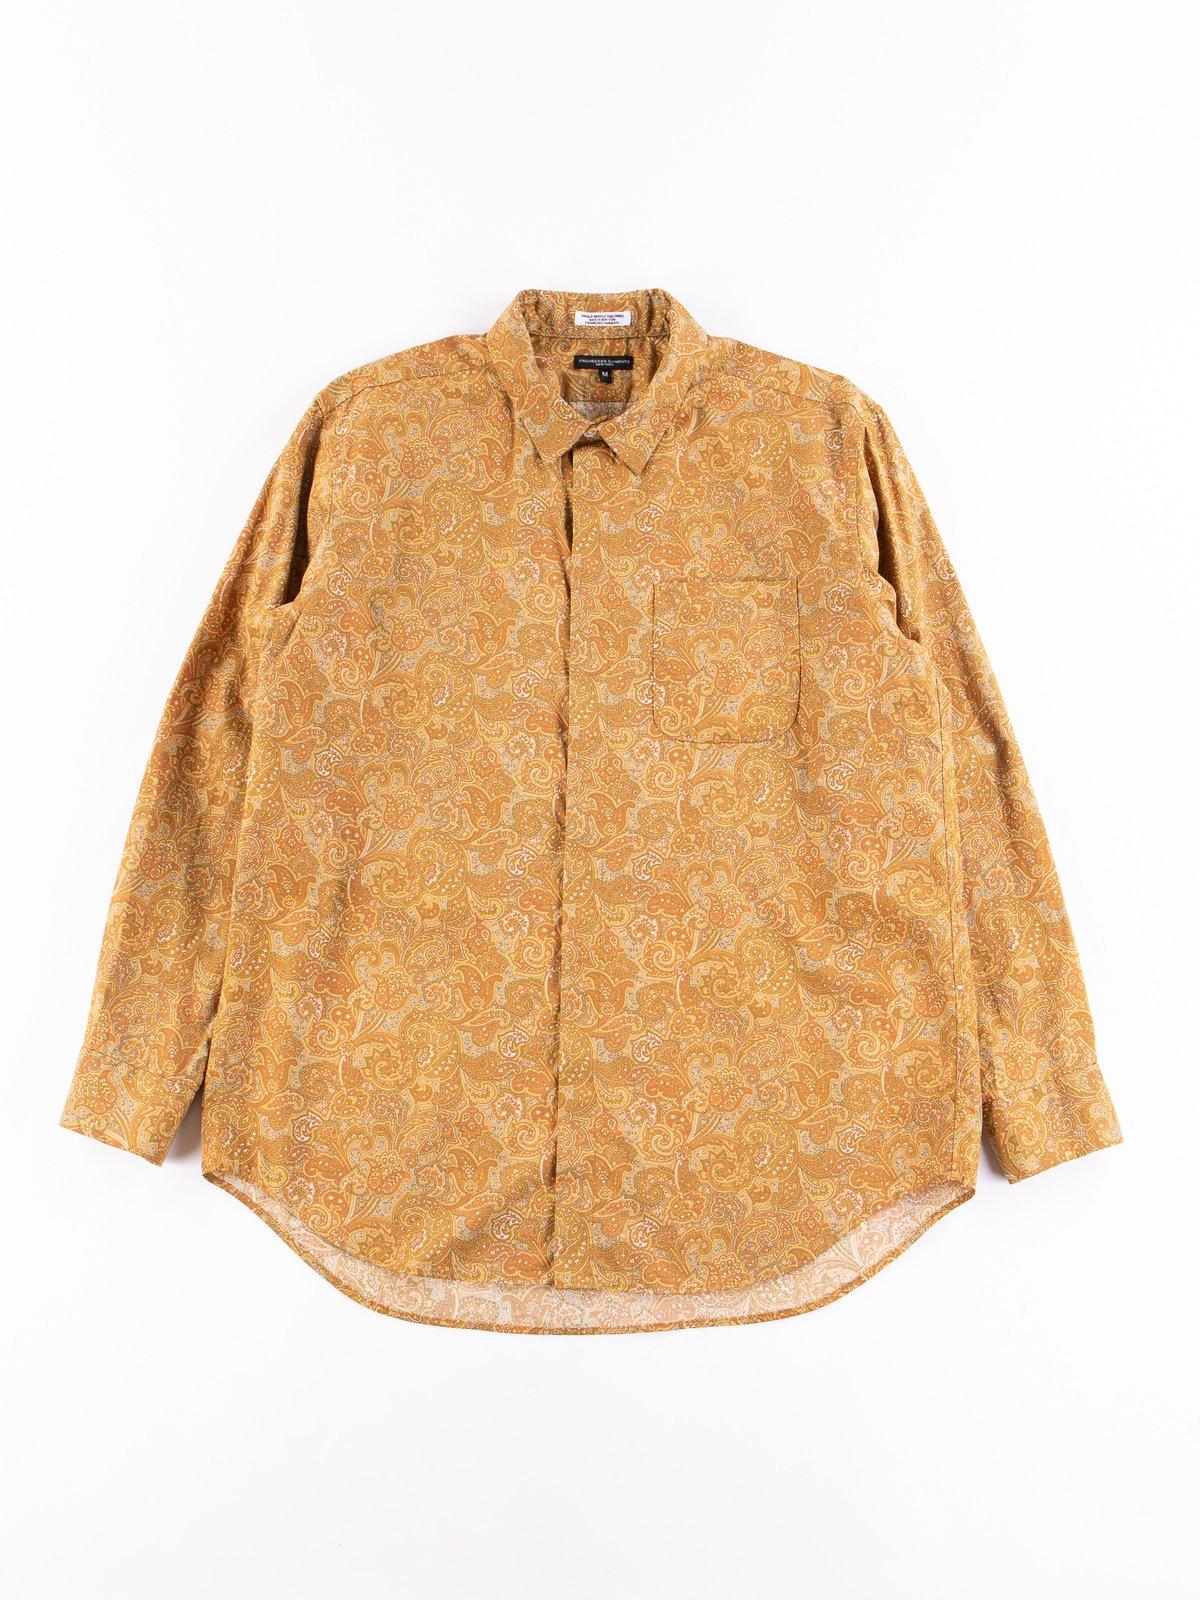 Tan/Olive Cotton Paisley Print Short Collar Shirt - Image 1